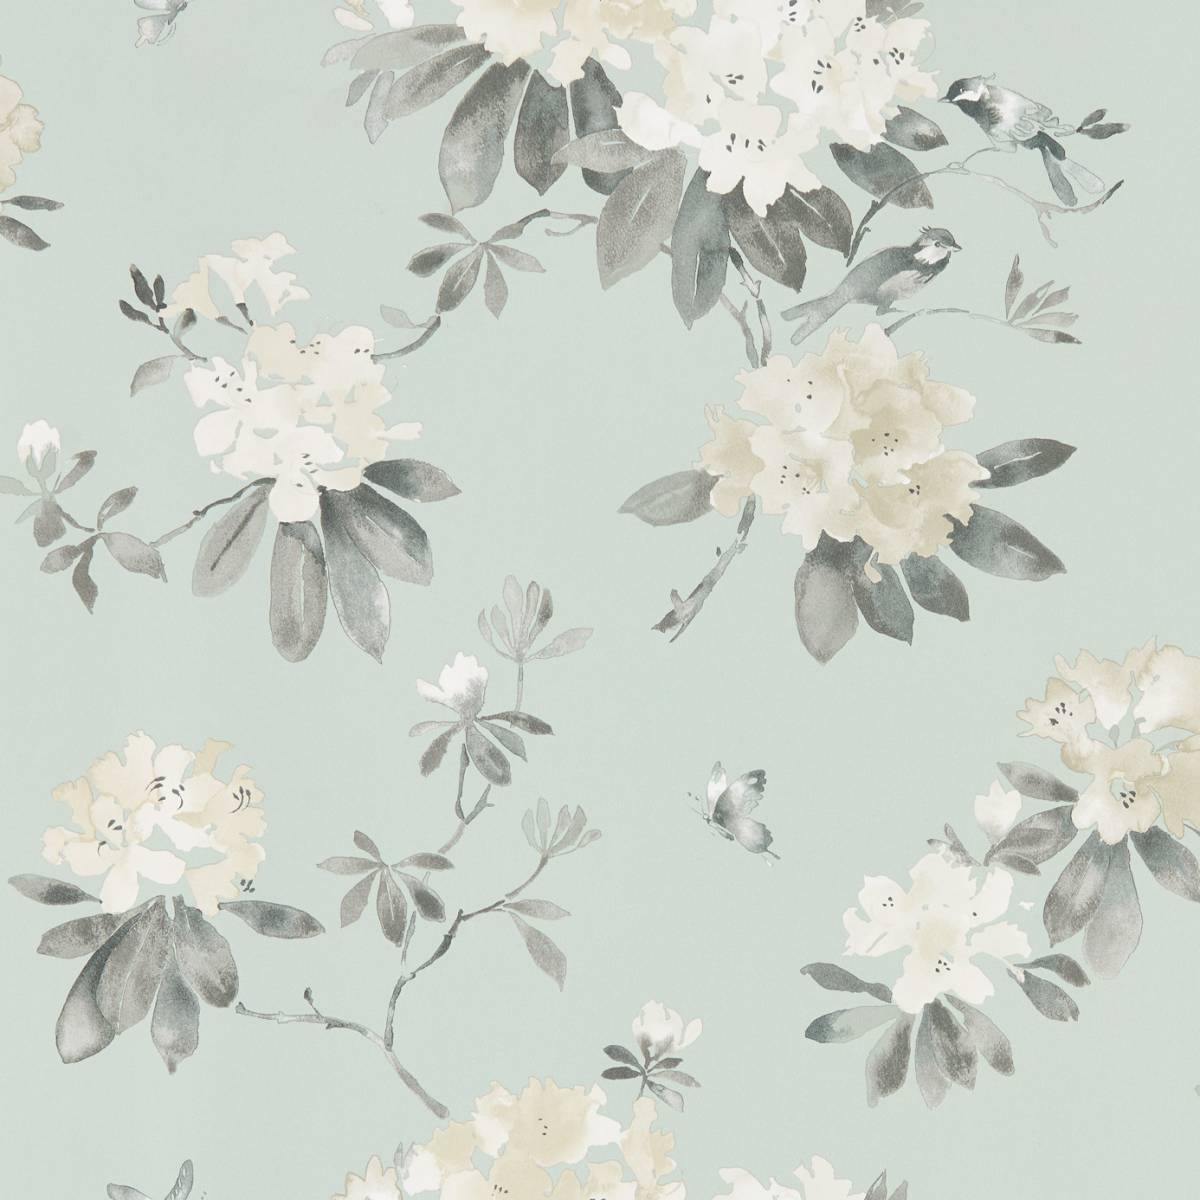 Sanderson Waterperry Wallpapers Rhodera Wallpaper - Aqua - 216263. Loading zoom